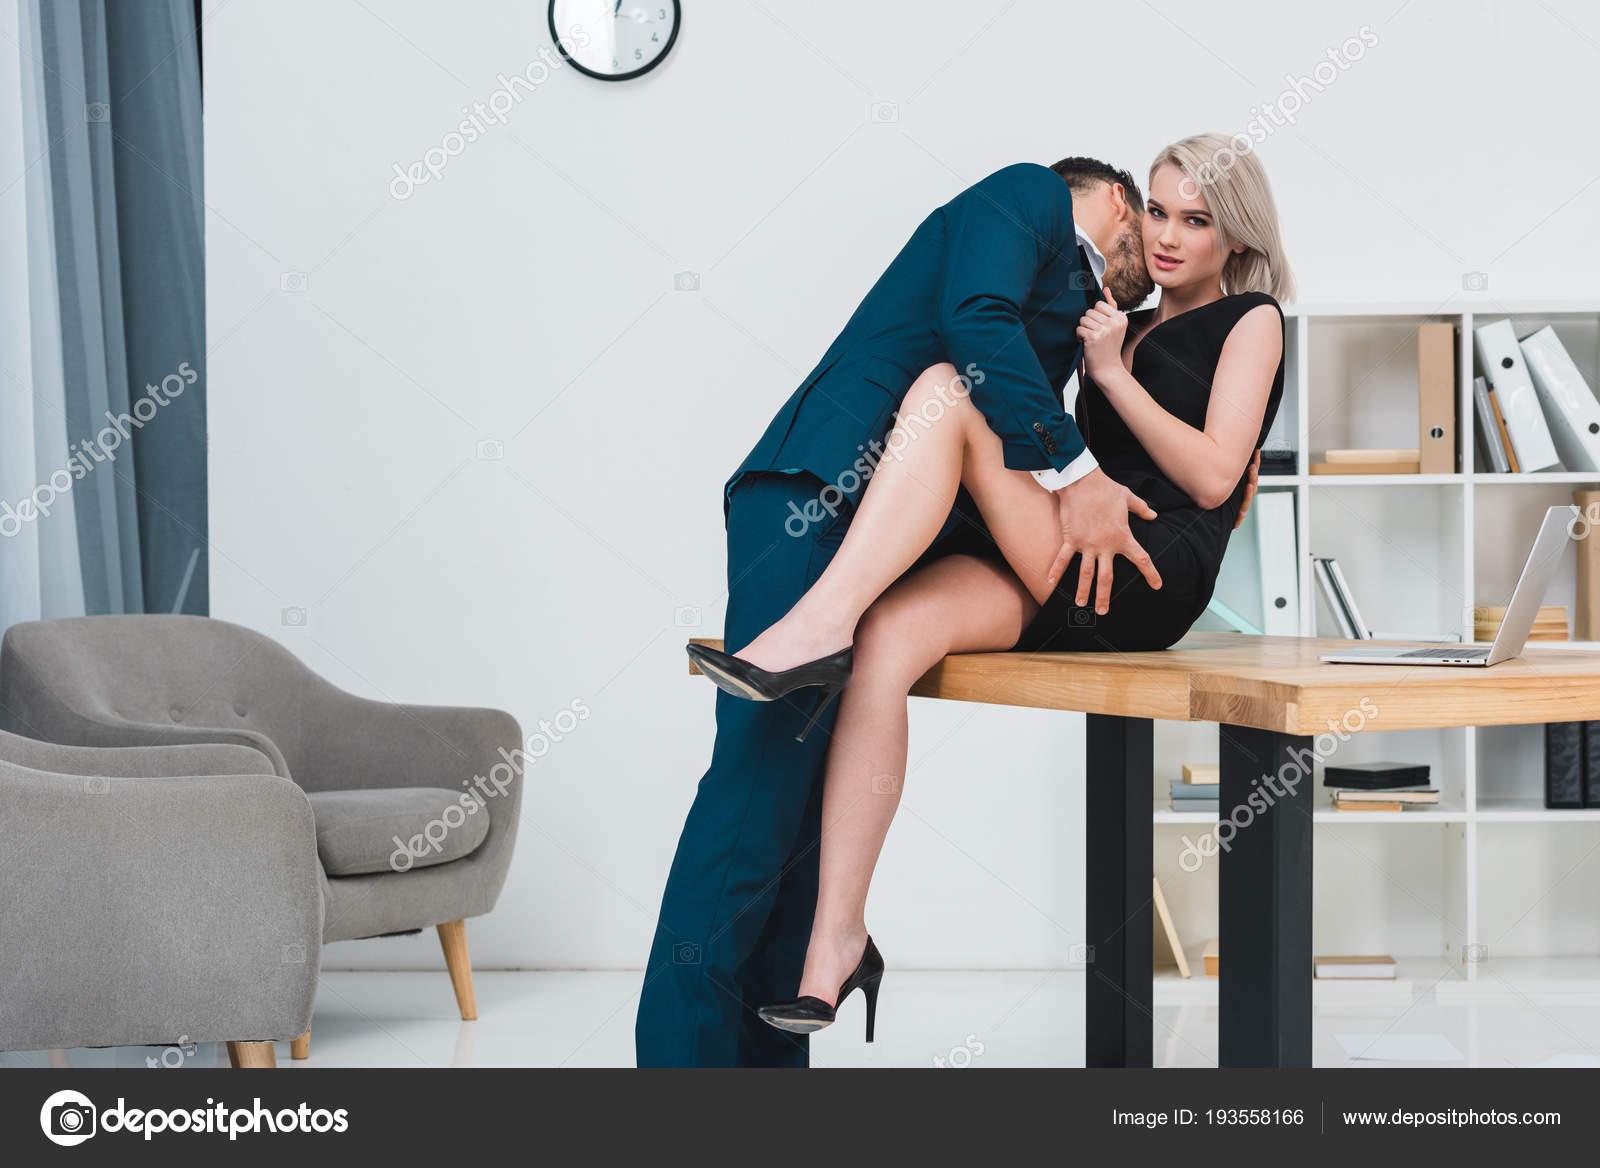 Flirt Im Büro, Sex Im Haus